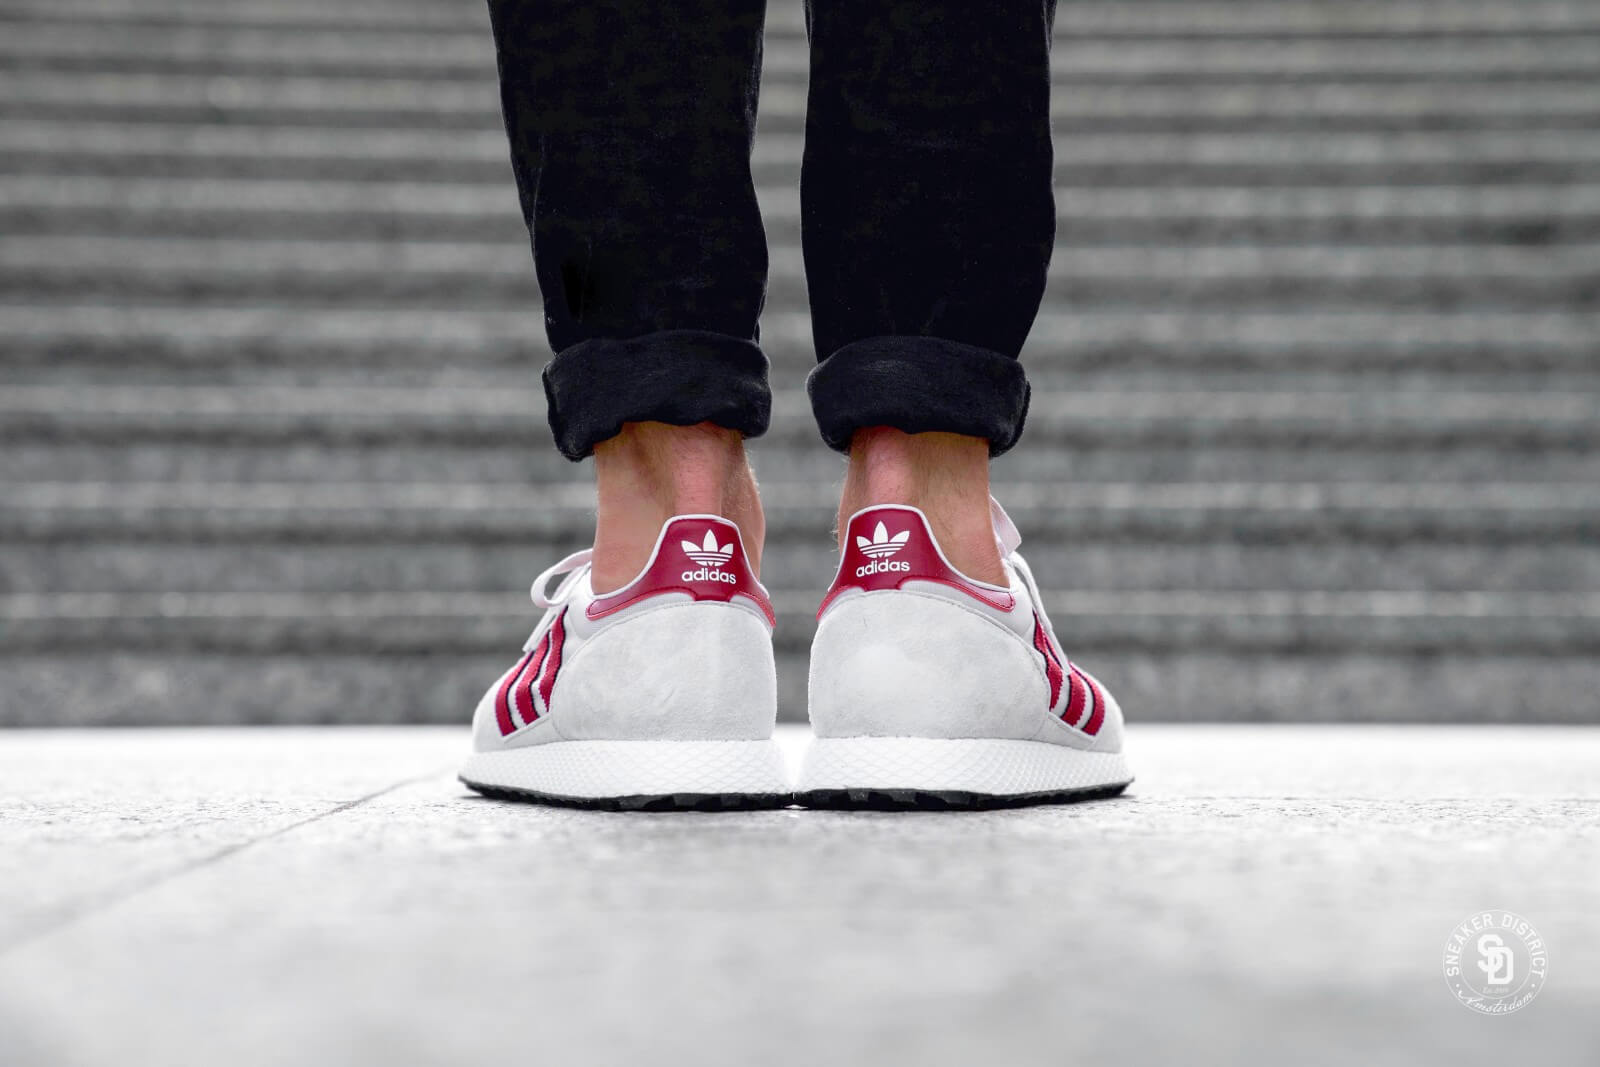 Adidas Forest Grove Chalk Pearl/White/Black - B41547